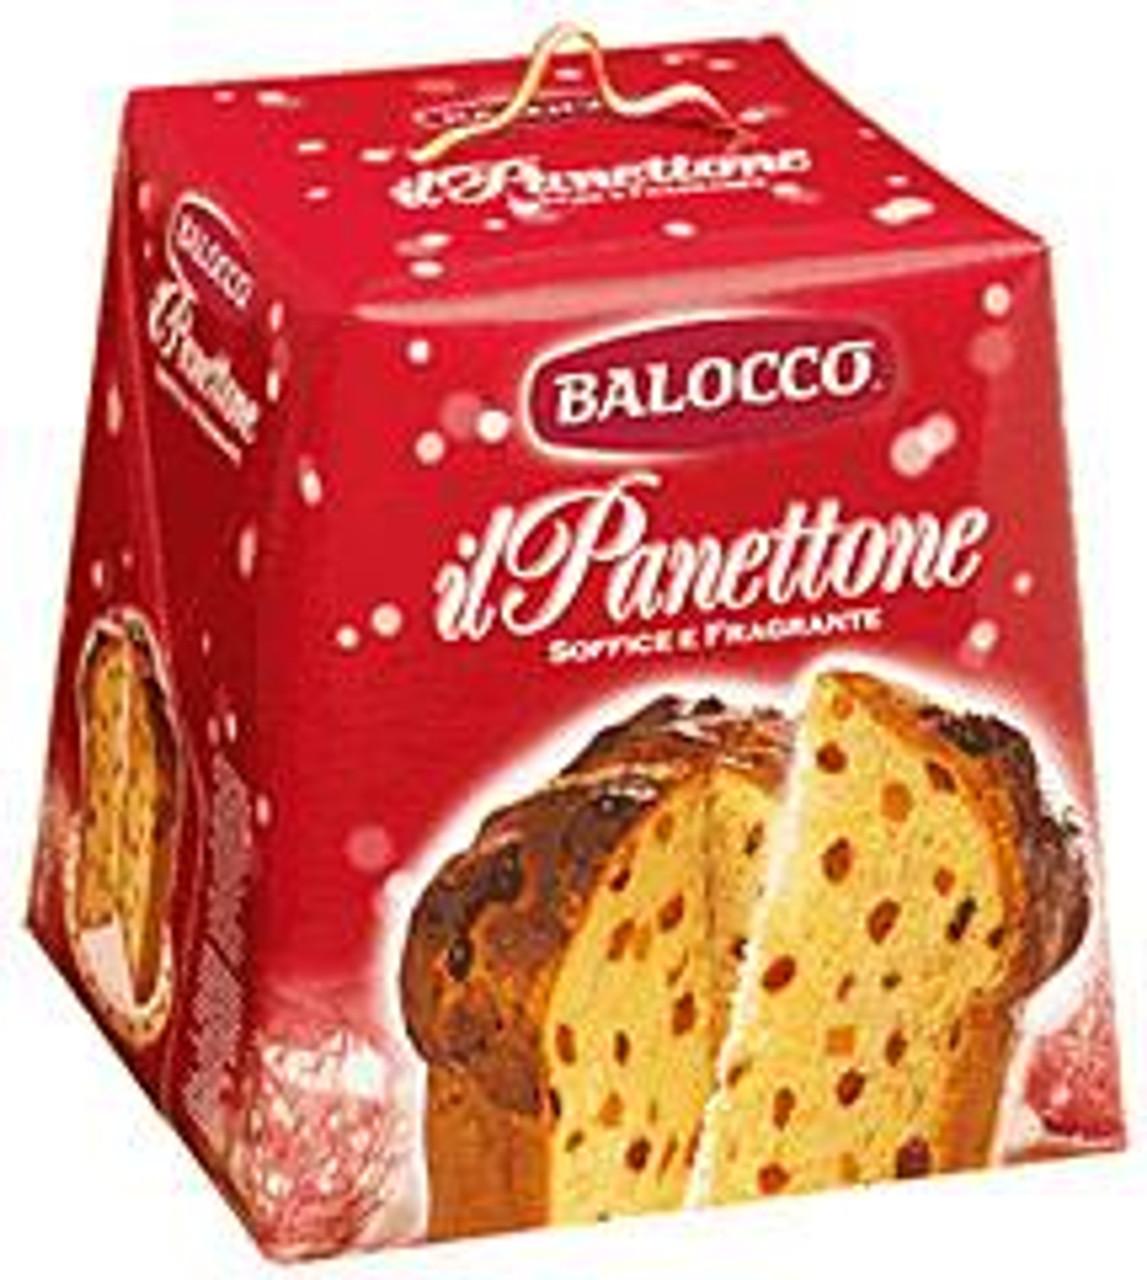 Balocco Panettone